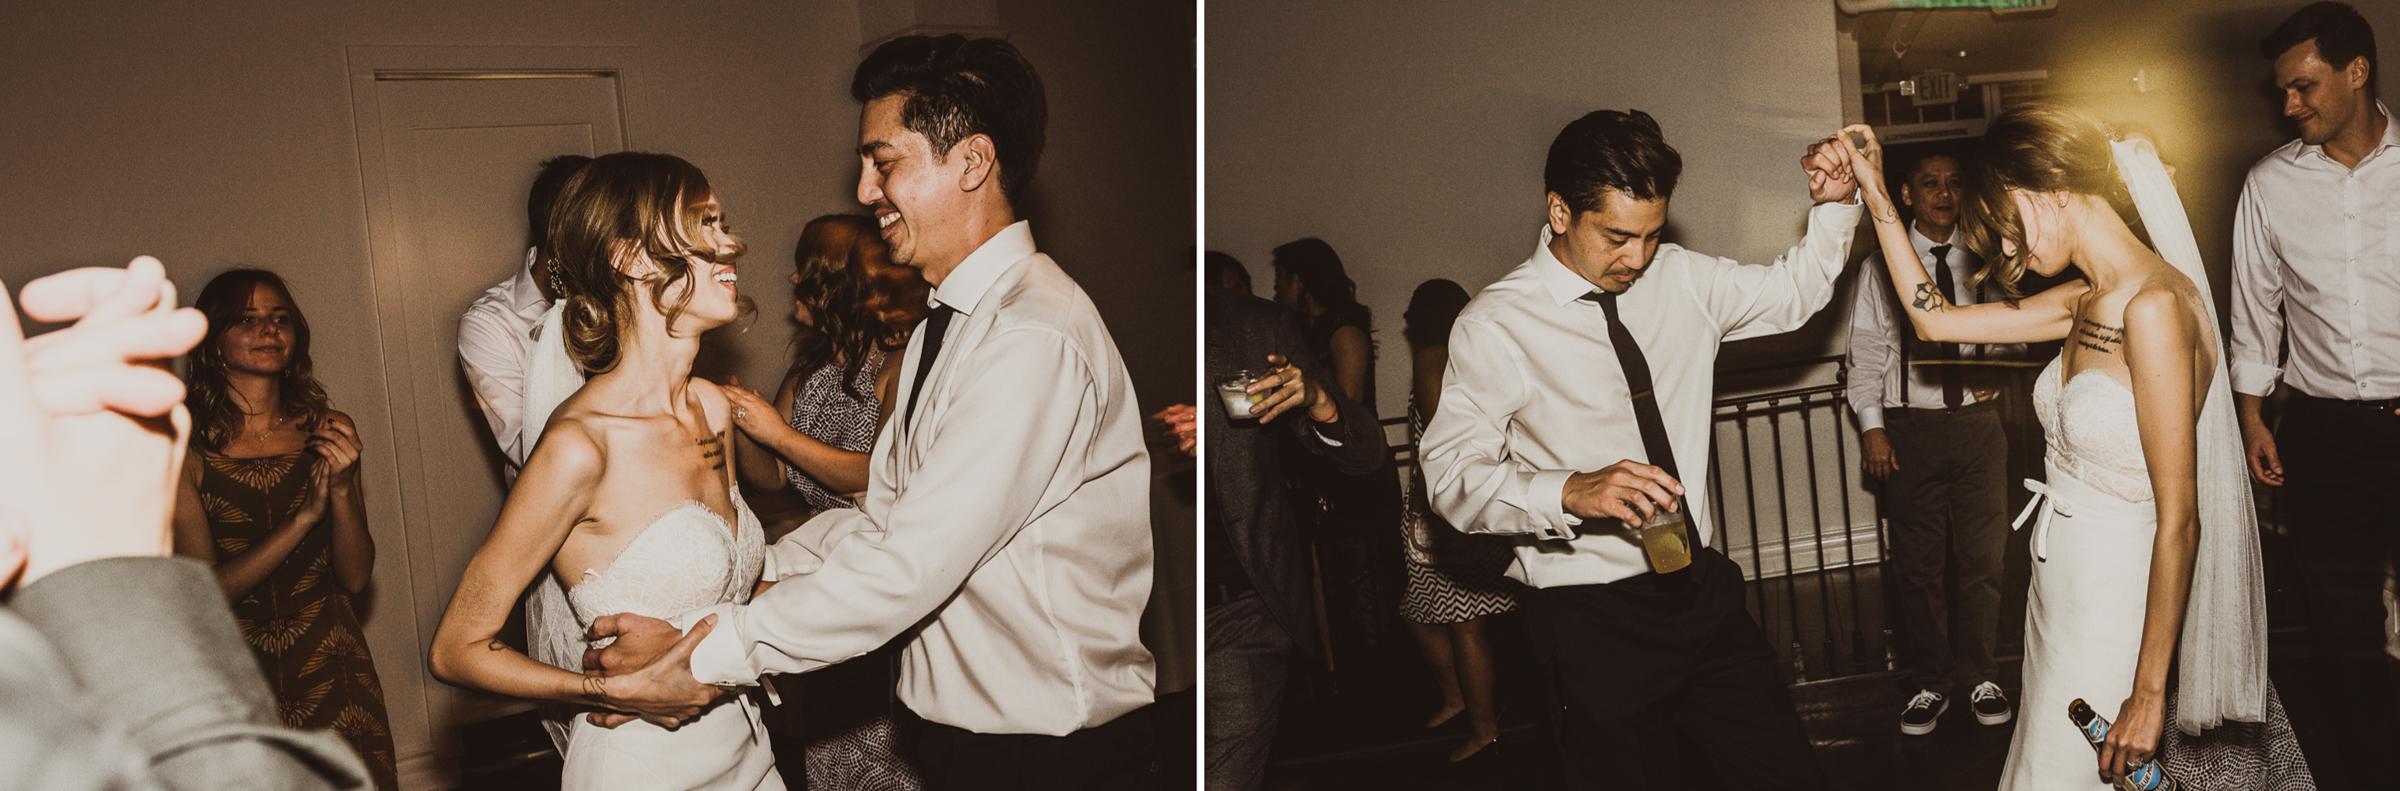 ©Isaiah + Taylor Photography - The Estate On Second Wedding, Santa Ana - Orange County Wedding Photographer-174.jpg